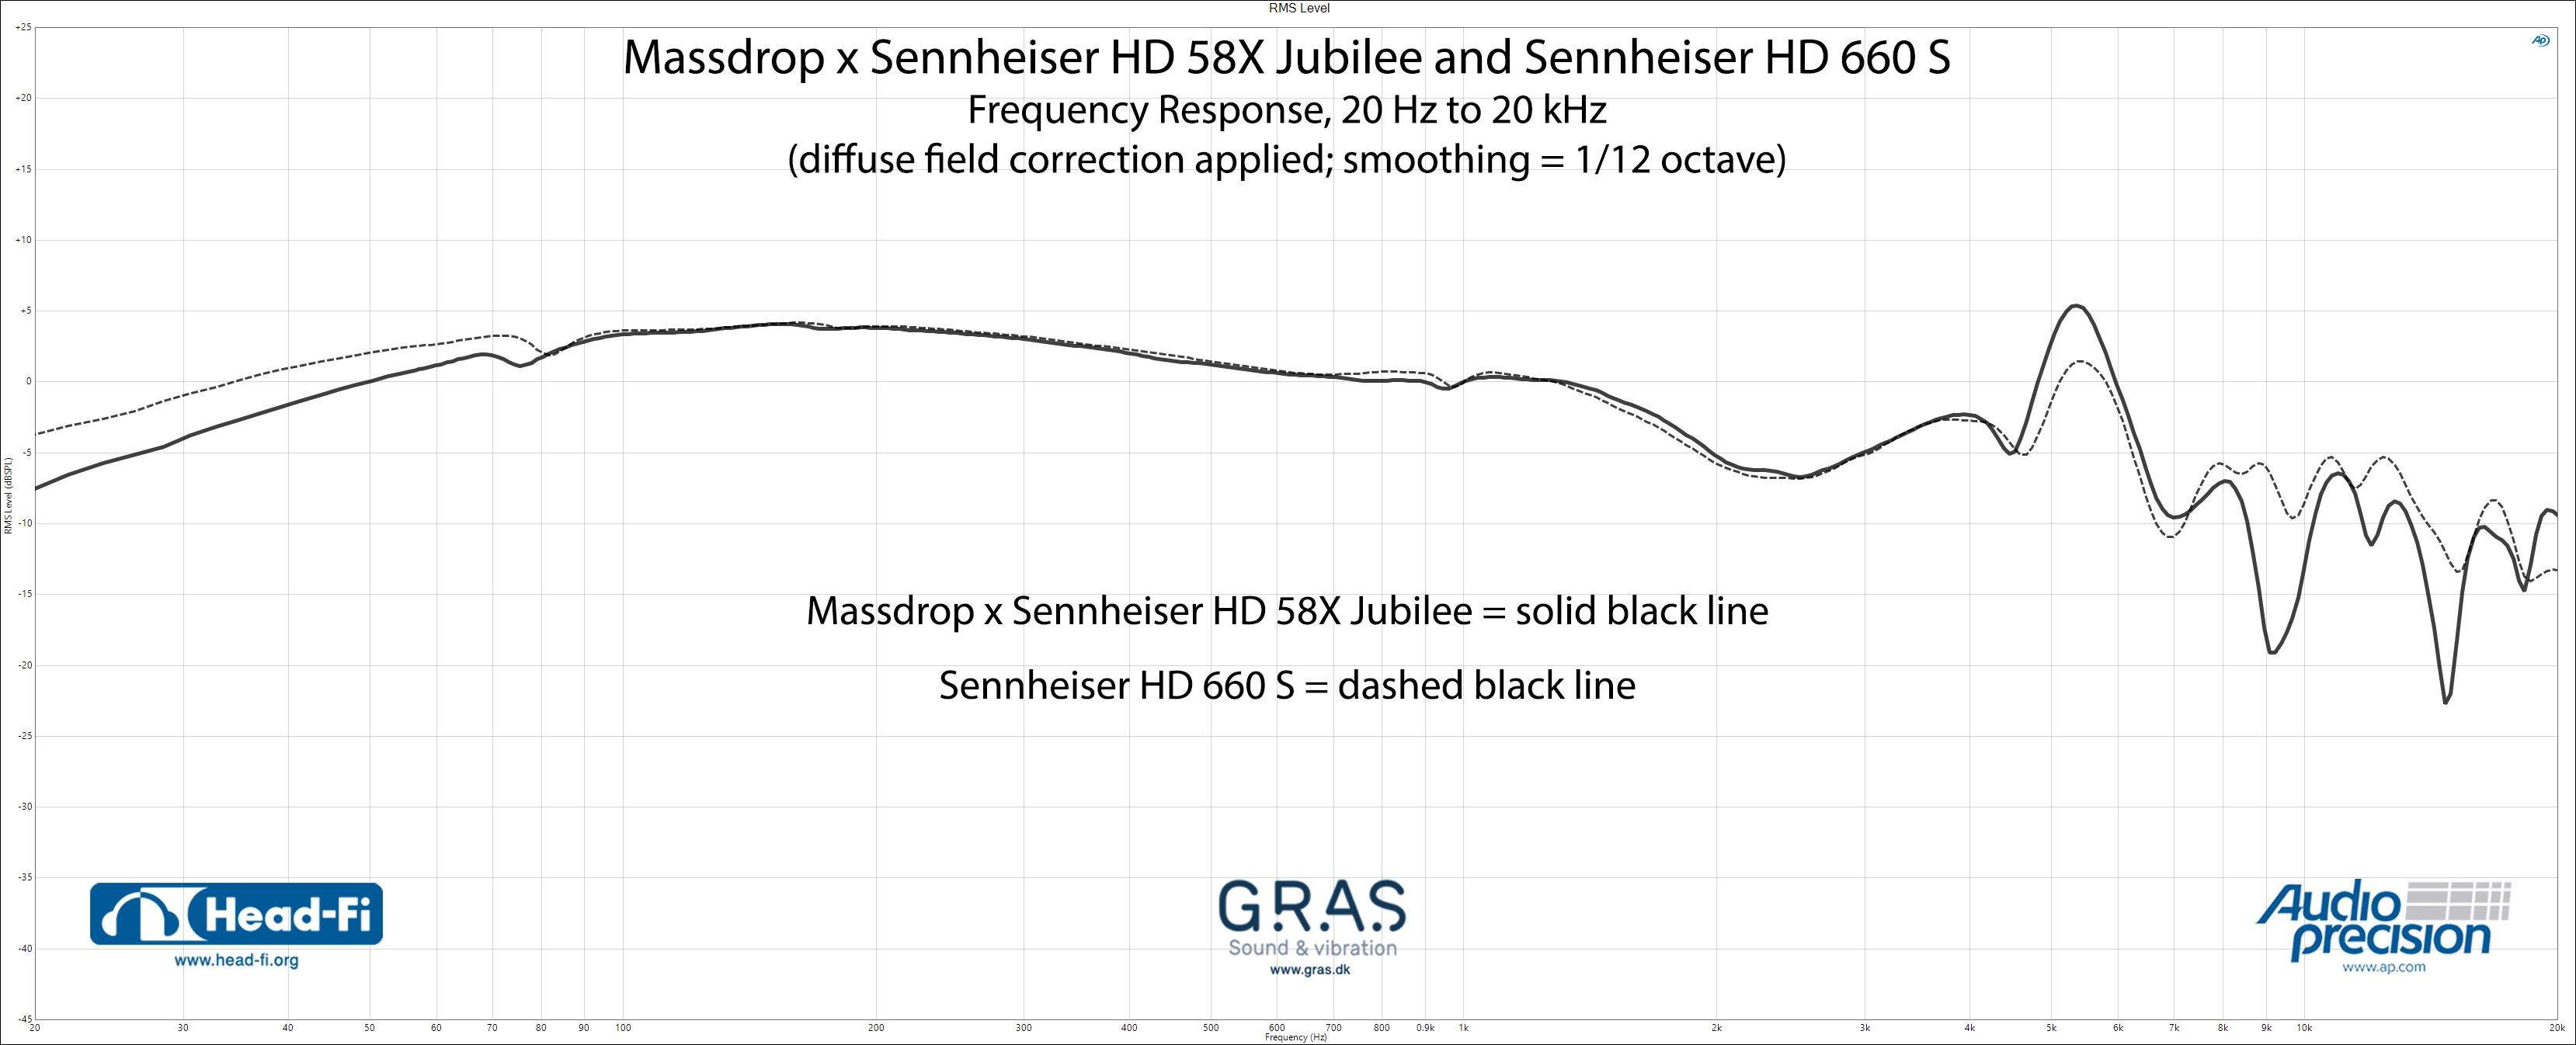 RMS-Level---Massdrop-x-Sennheiser-HD58X-Jubilee---Sennheiser-HD660S---DF.jpg